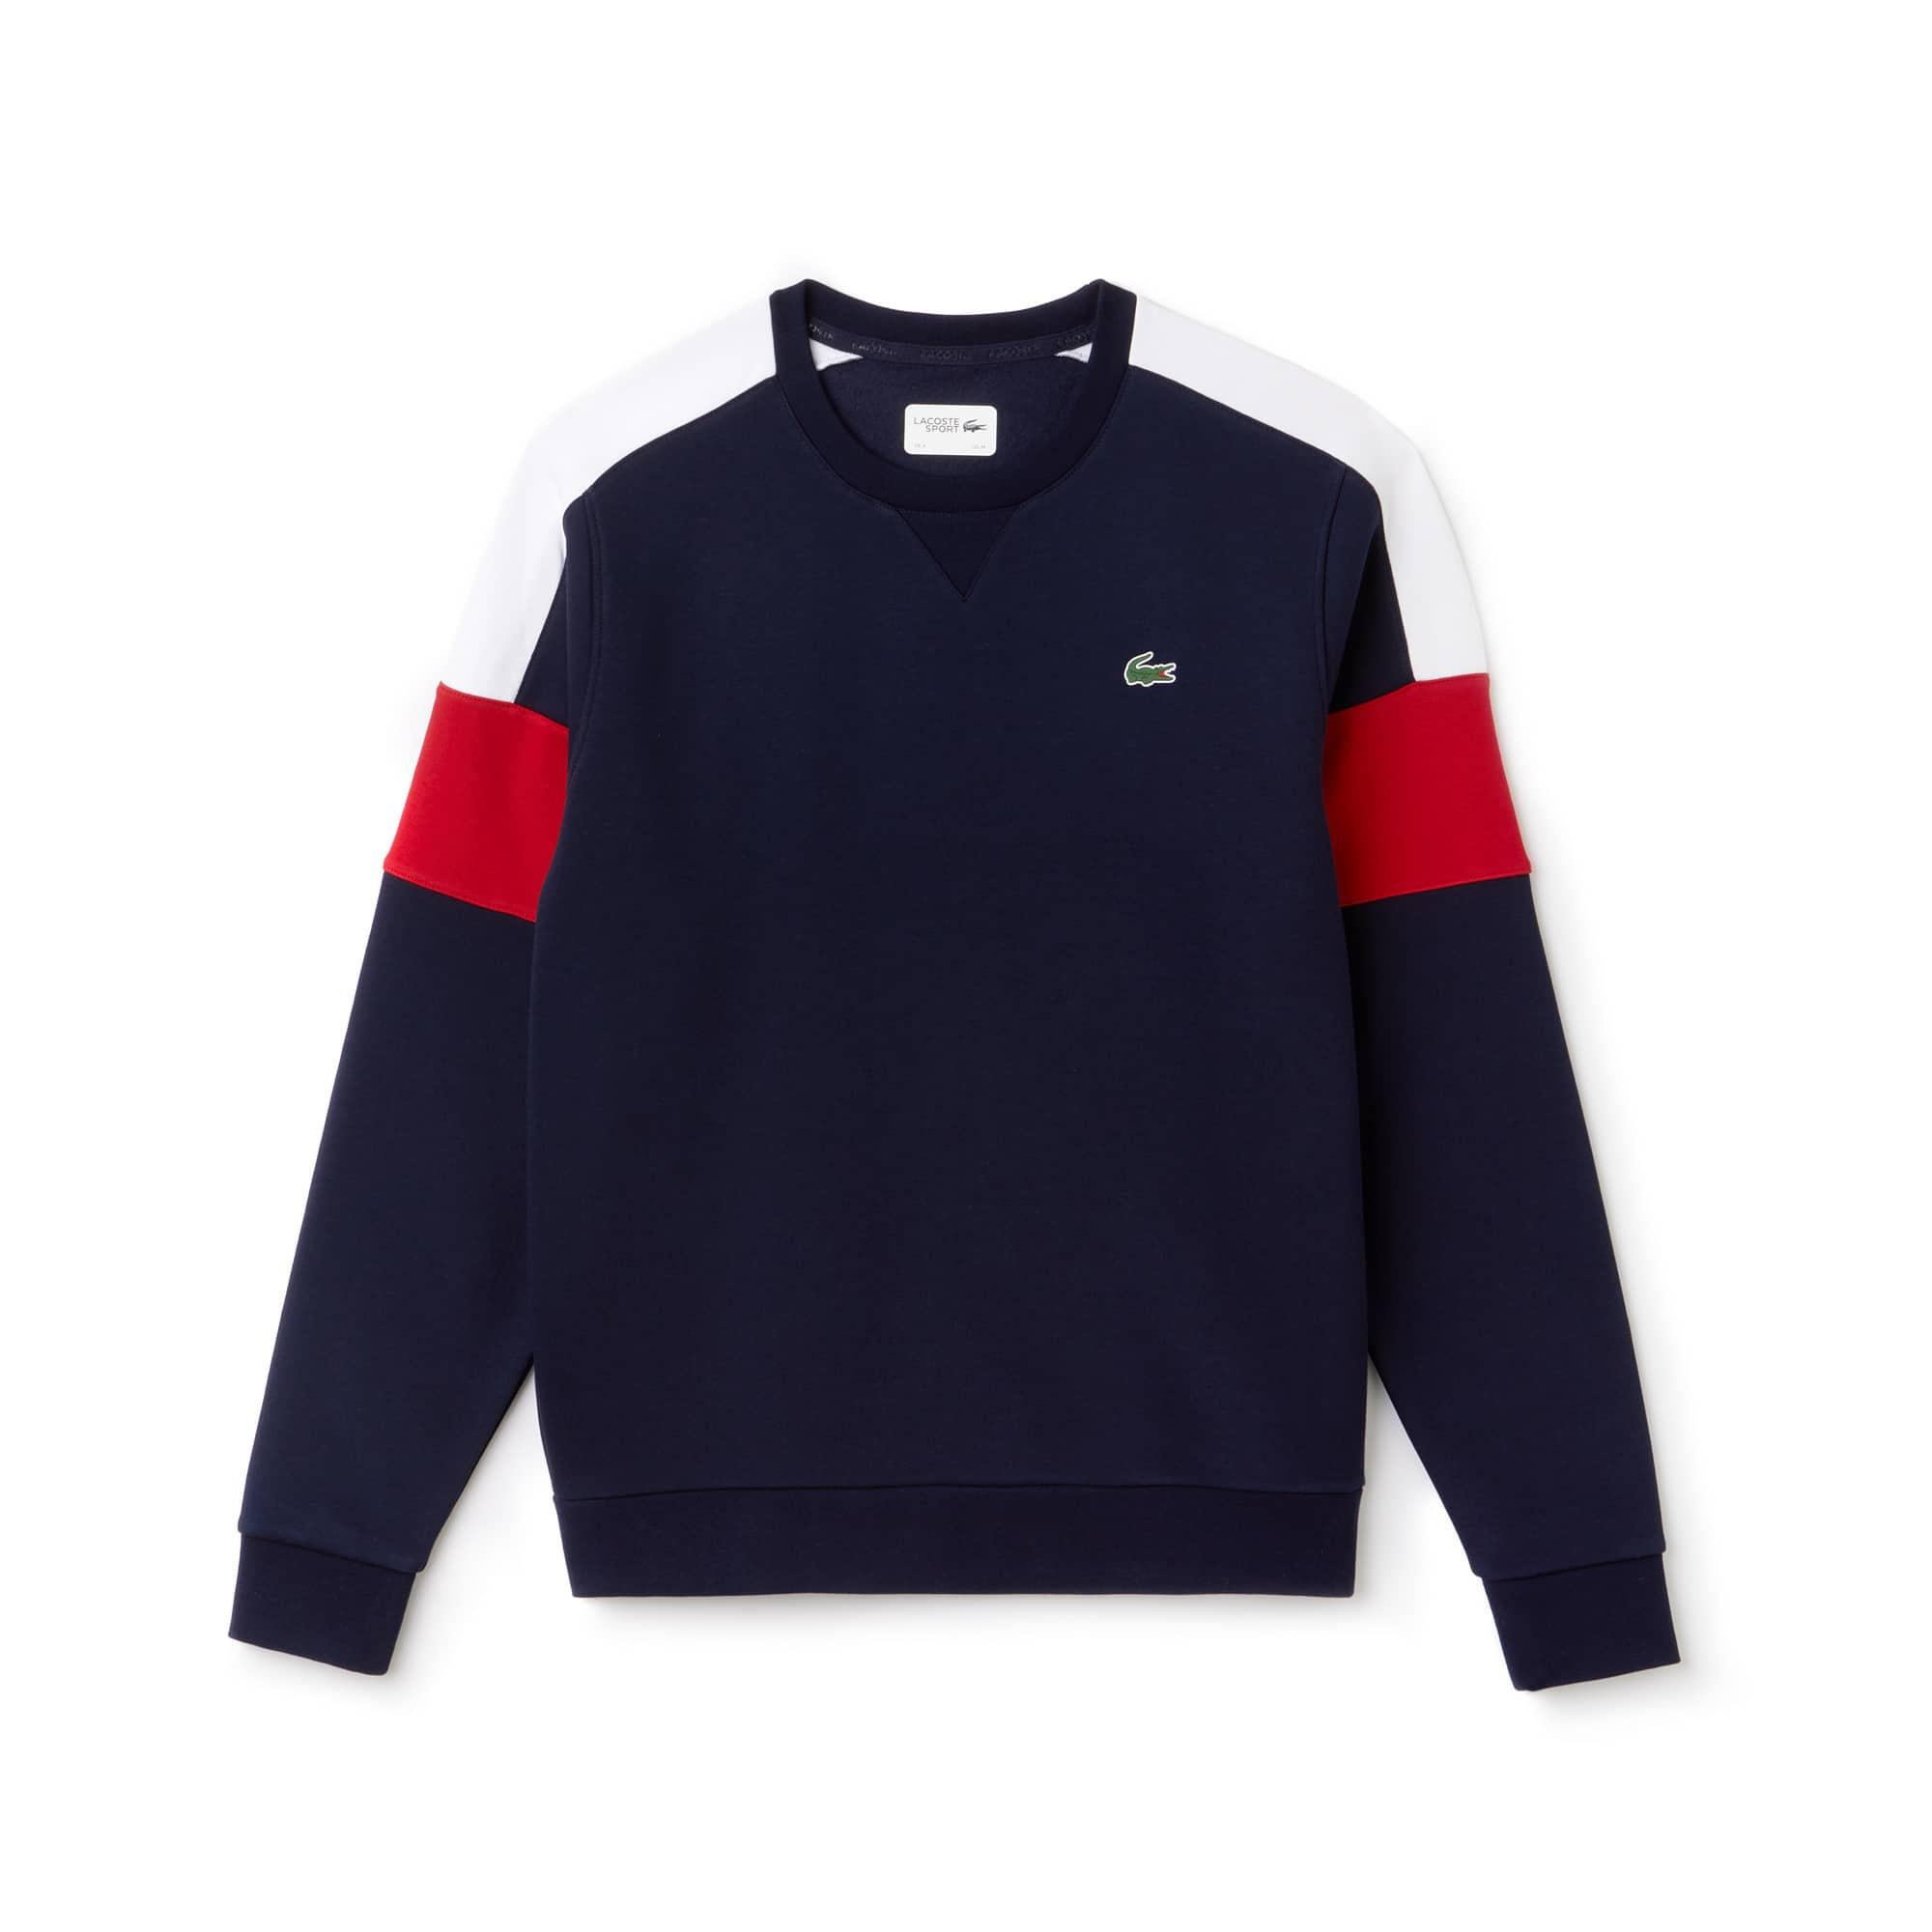 Sweatshirt Tennis Lacoste SPORT em moletão color block